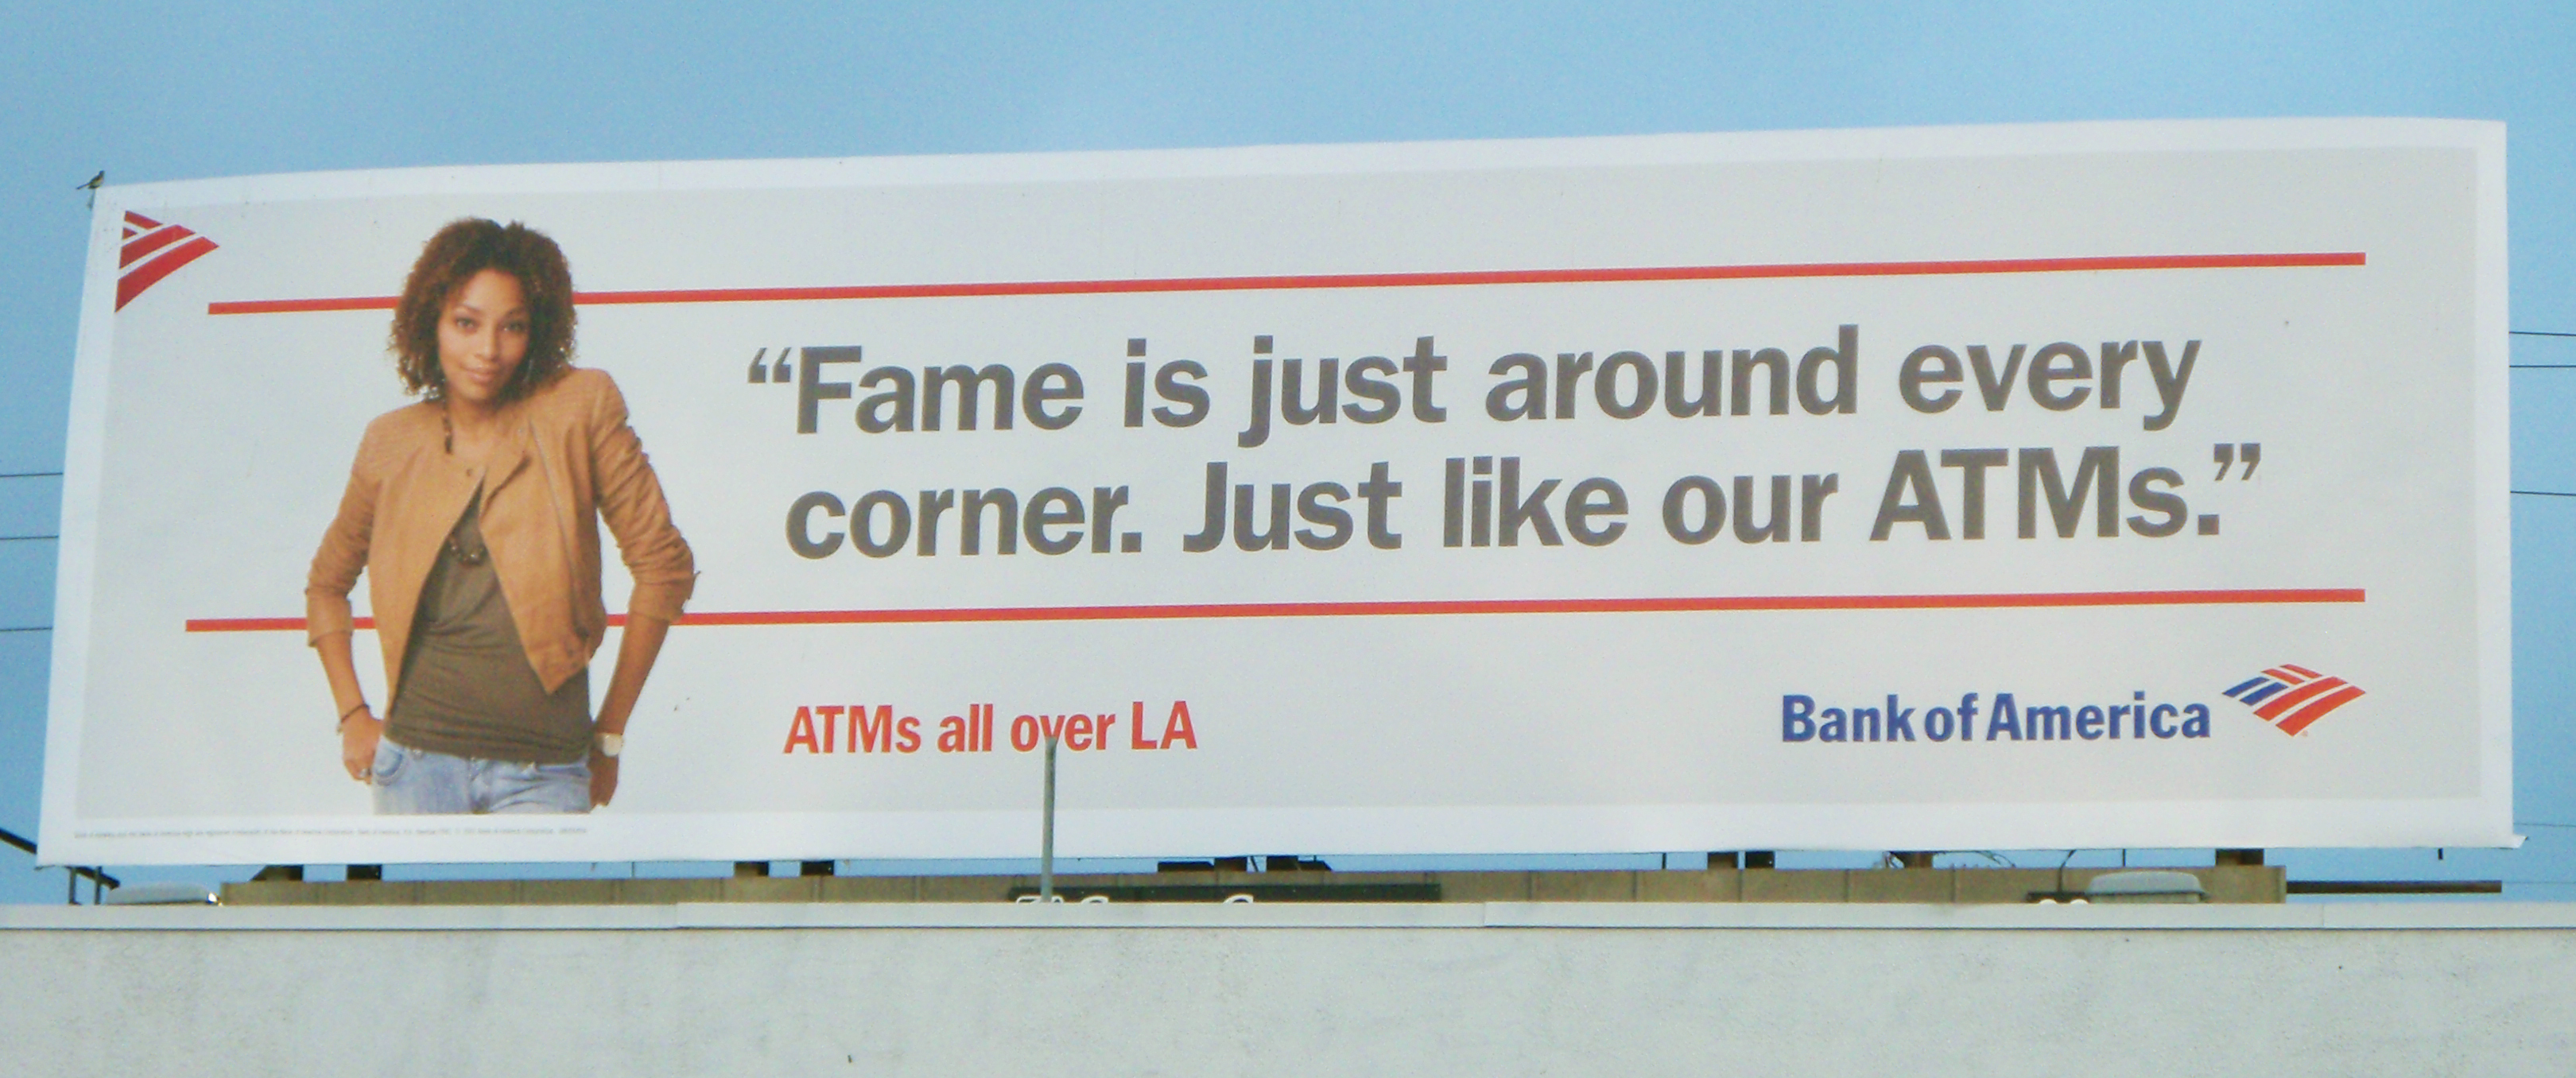 Battle Of The Bank Billboards Theadvertisingeye